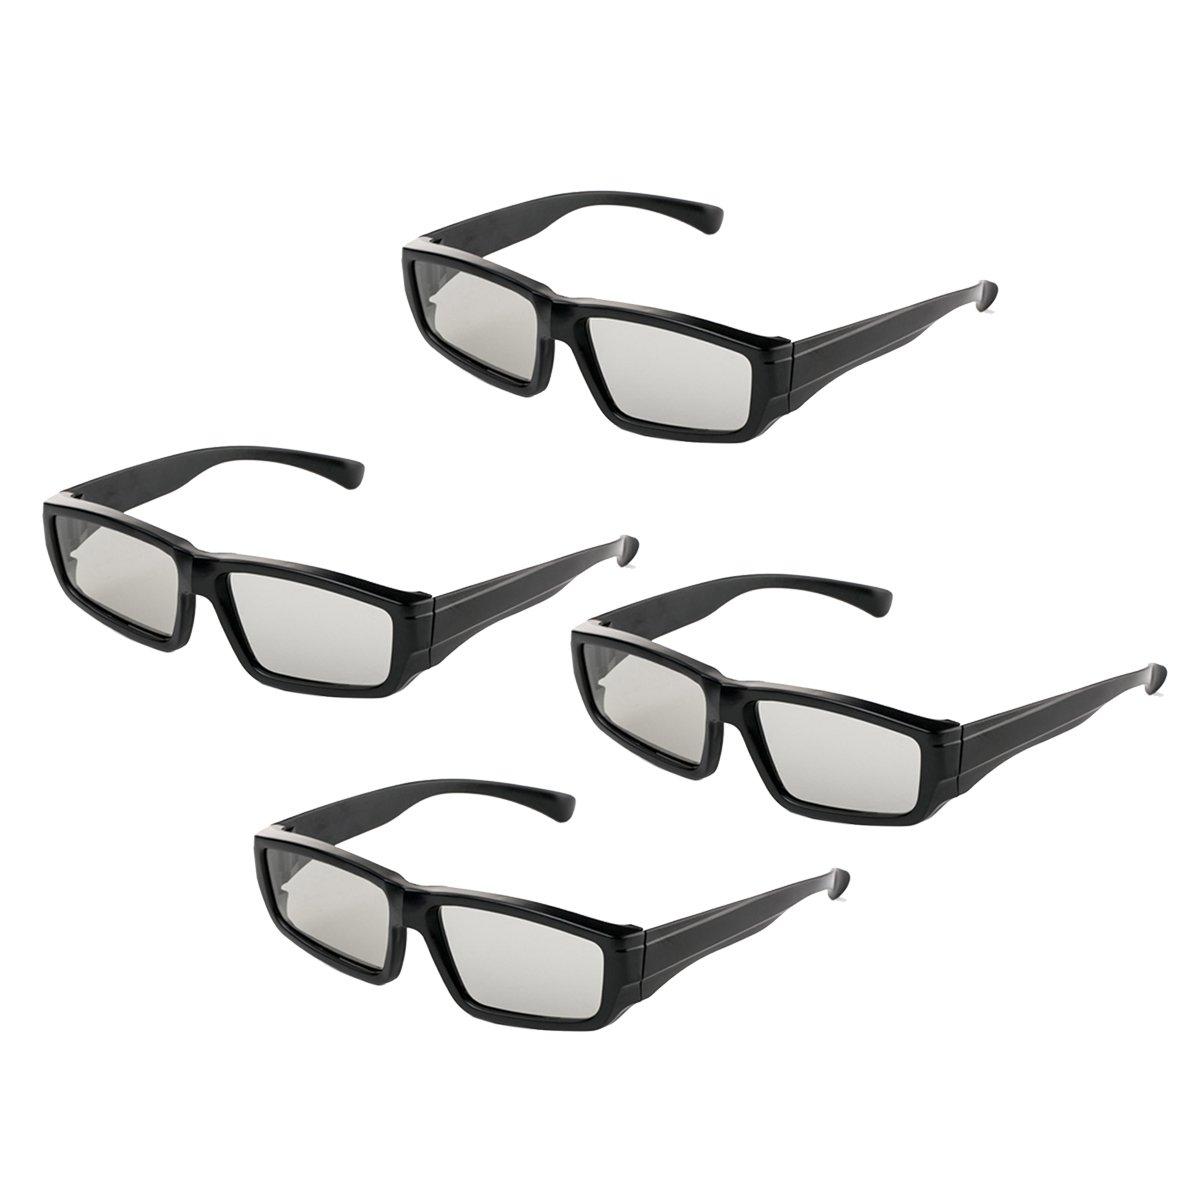 dad956c57a Gafas 3D pasivas Lentes polarizadas circulares para la familia Todas las  edades Sony Sharp Toshiba LG